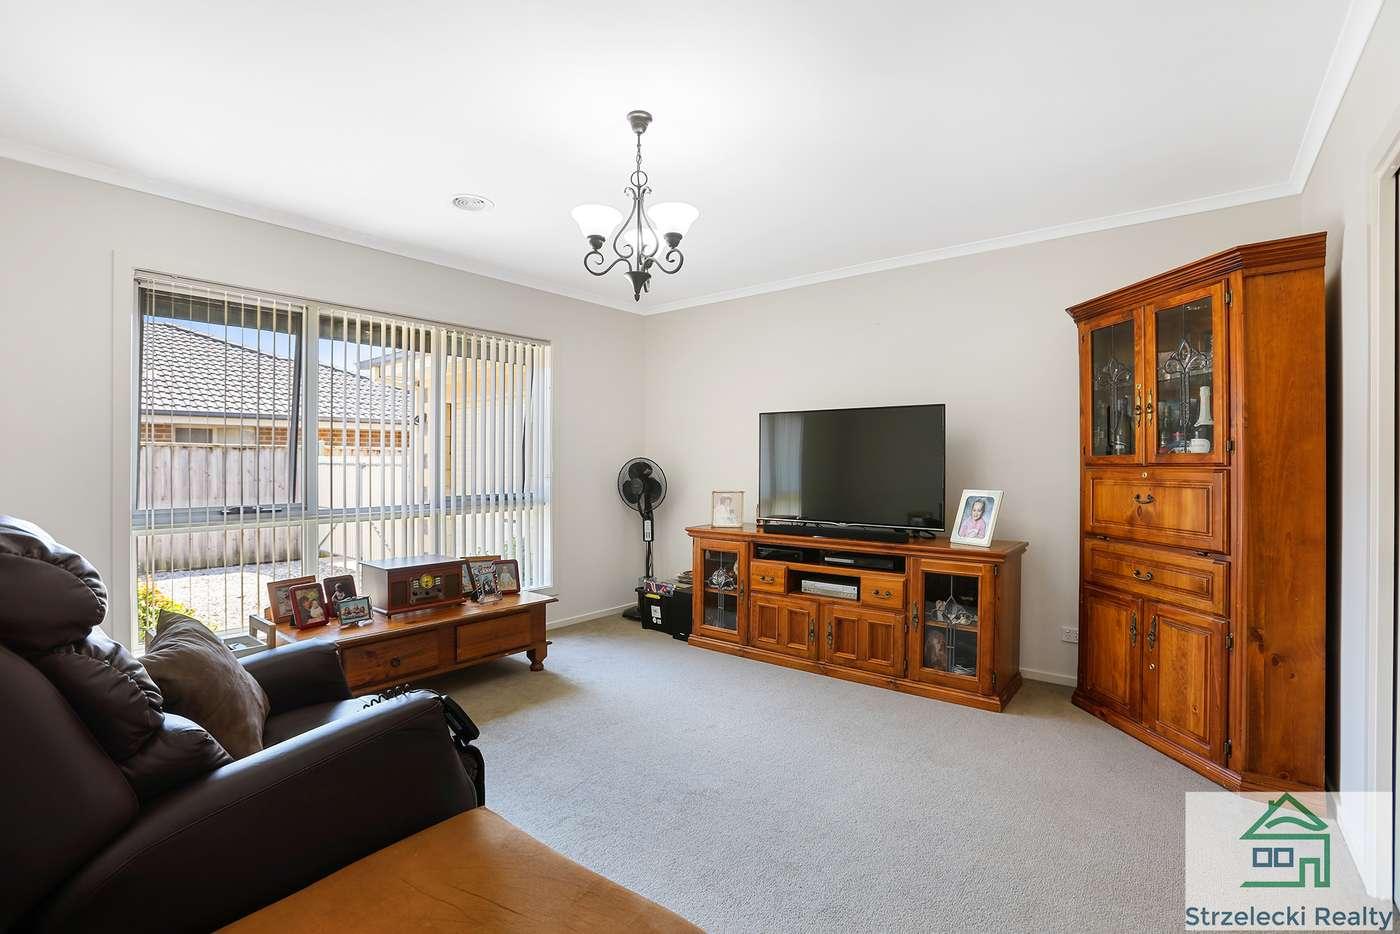 Seventh view of Homely house listing, 43 Murray St, Trafalgar VIC 3824